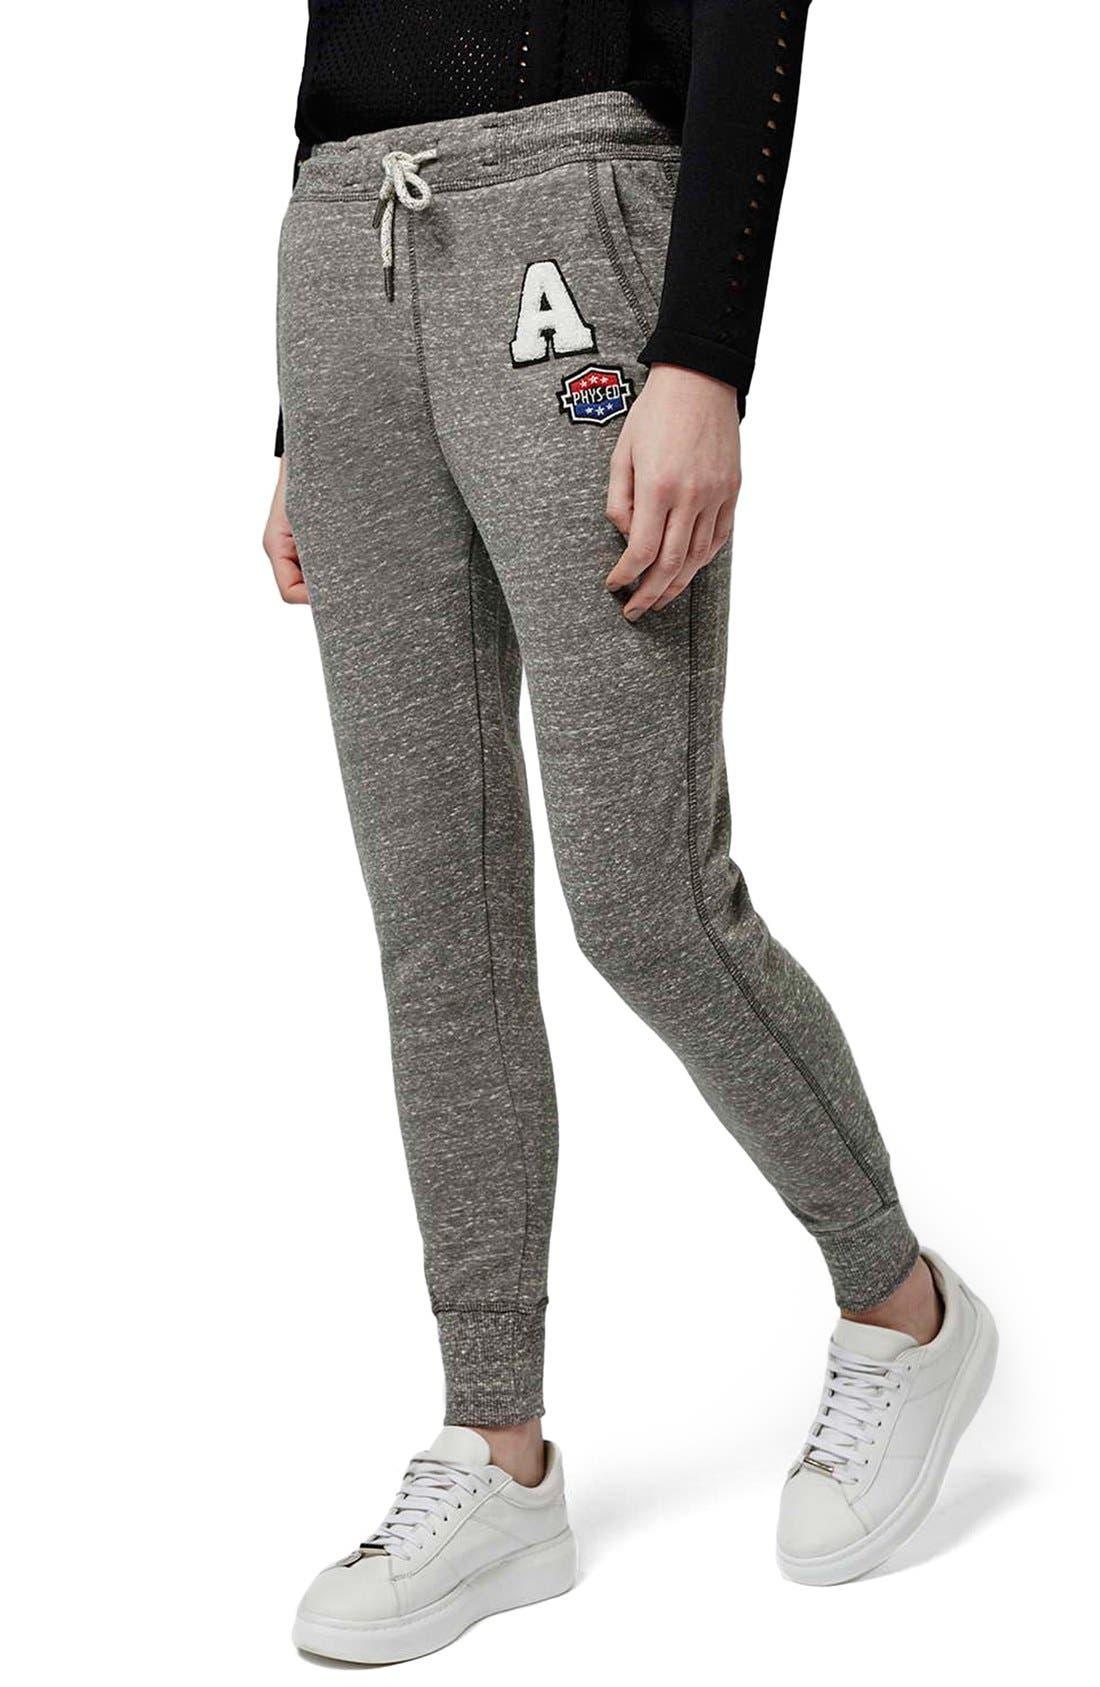 Alternate Image 1 Selected - Topshop 'Jenner' Badge Jogger Pants